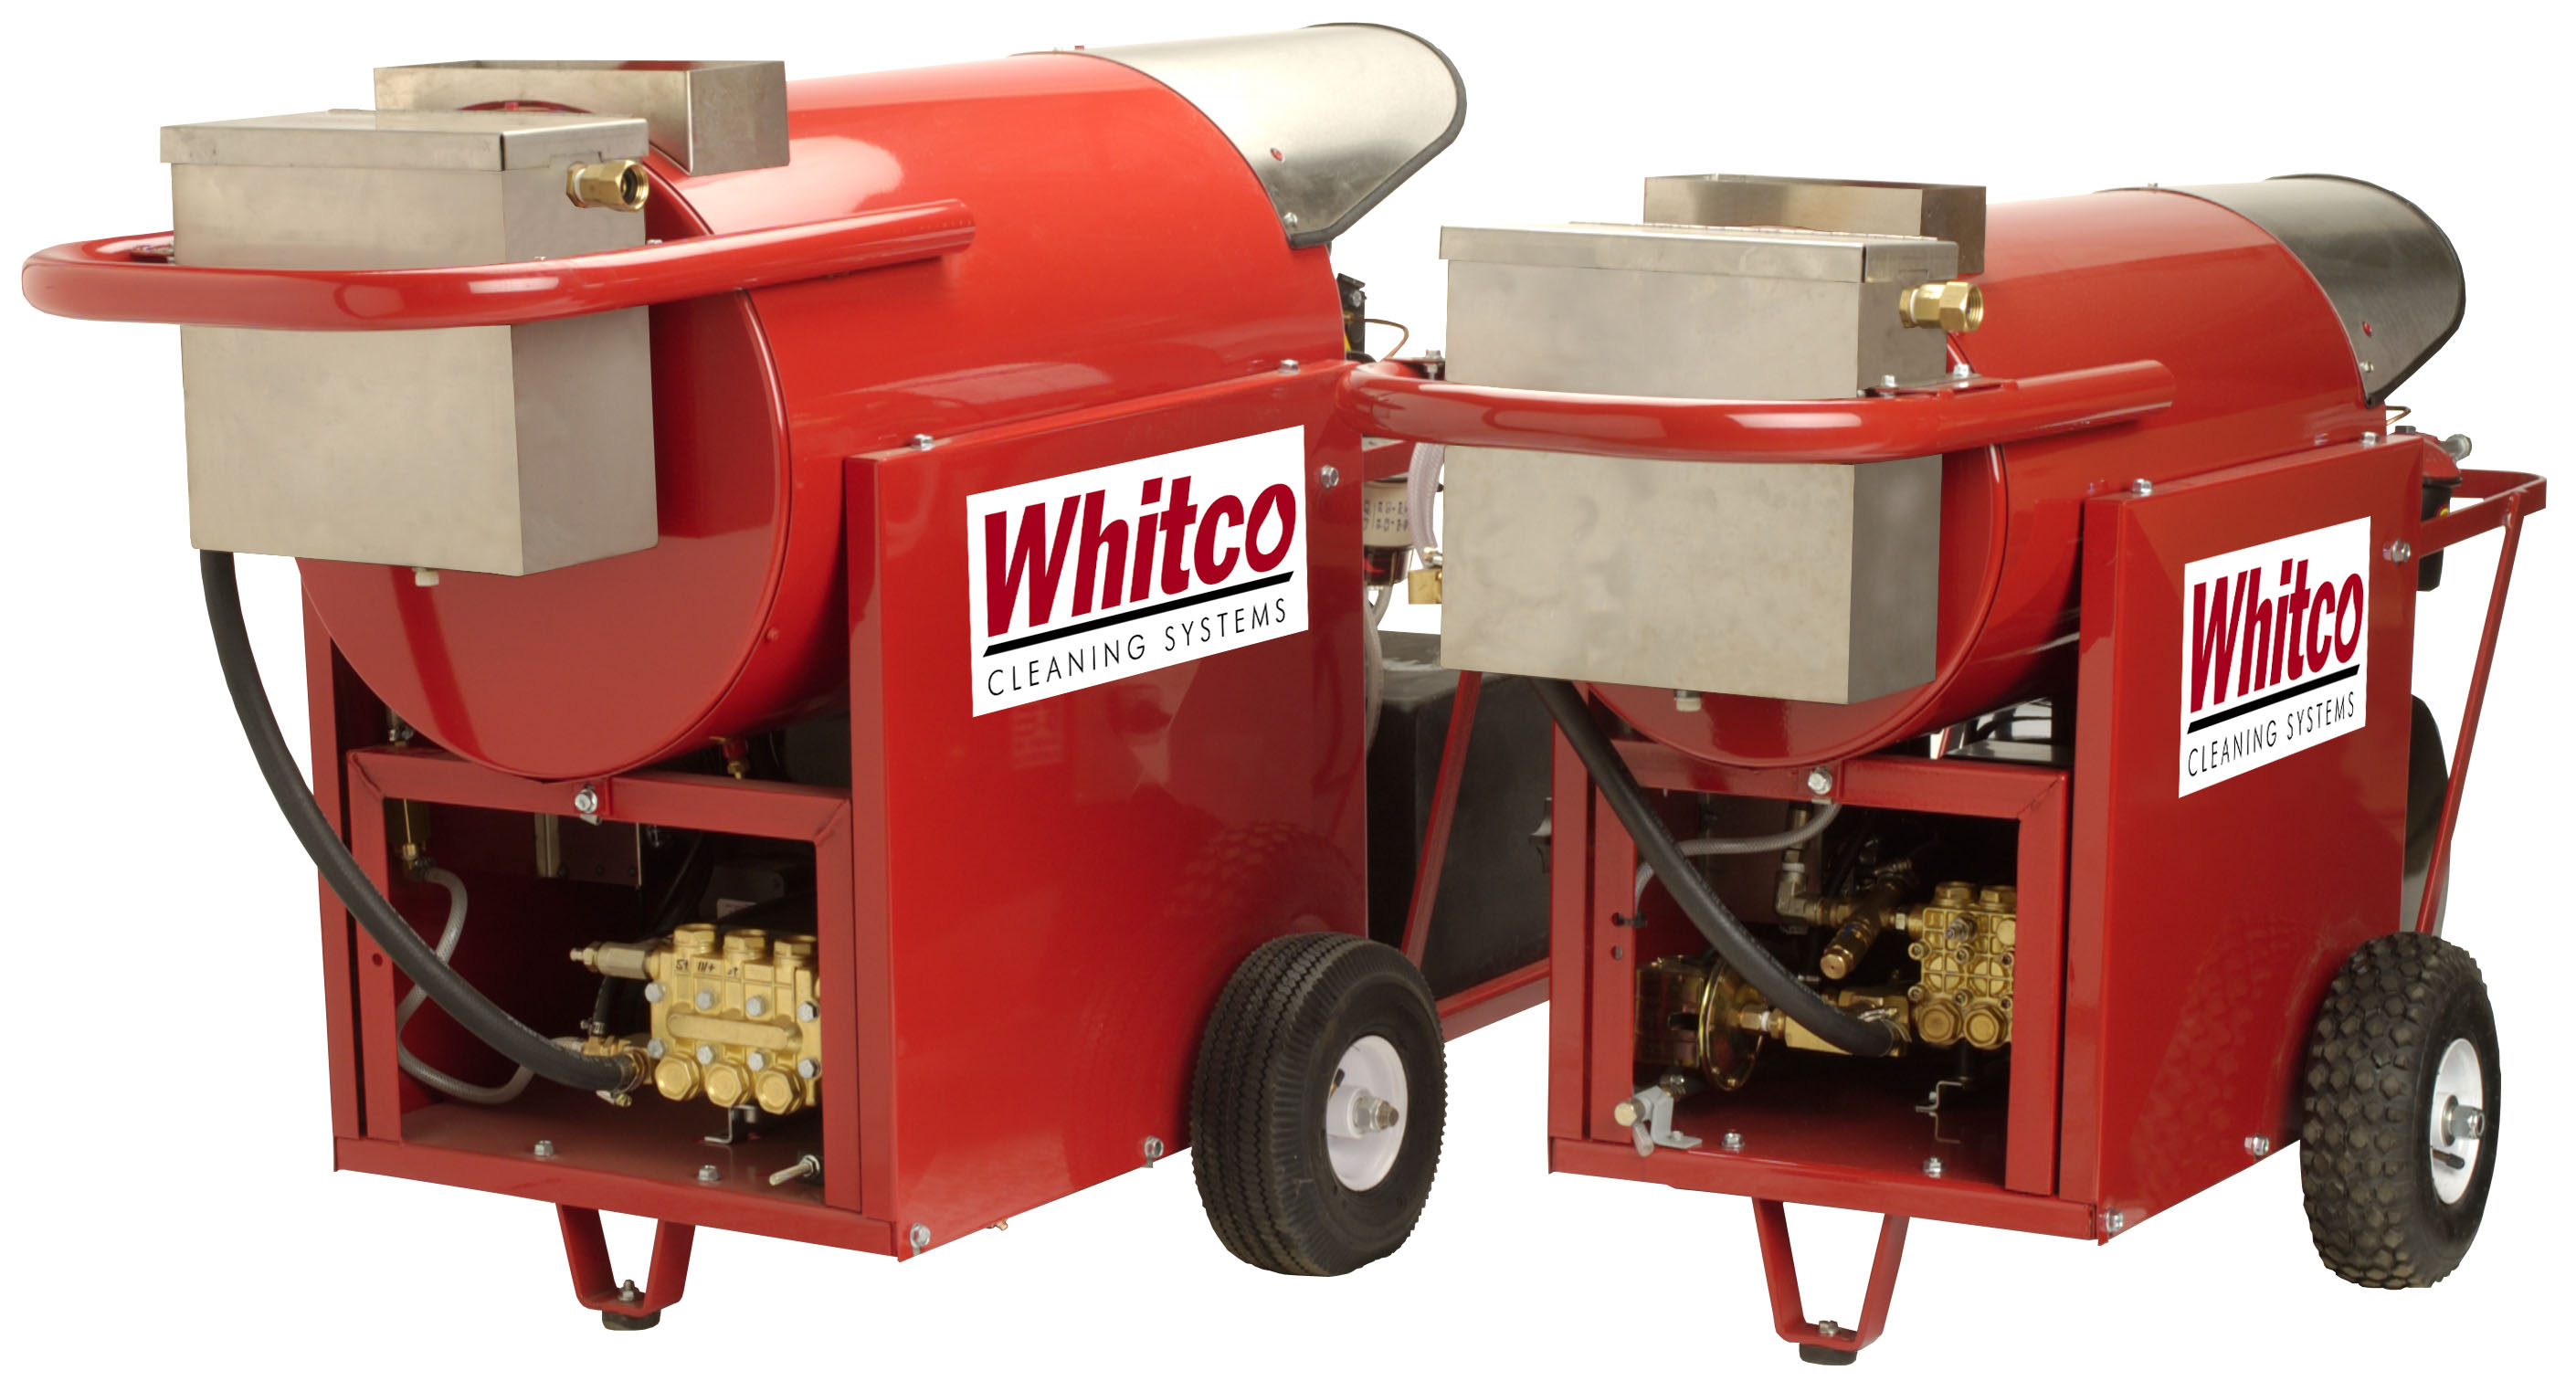 STINGER PRESSURE WASHERS - WHITCO - Power Wash Solutions